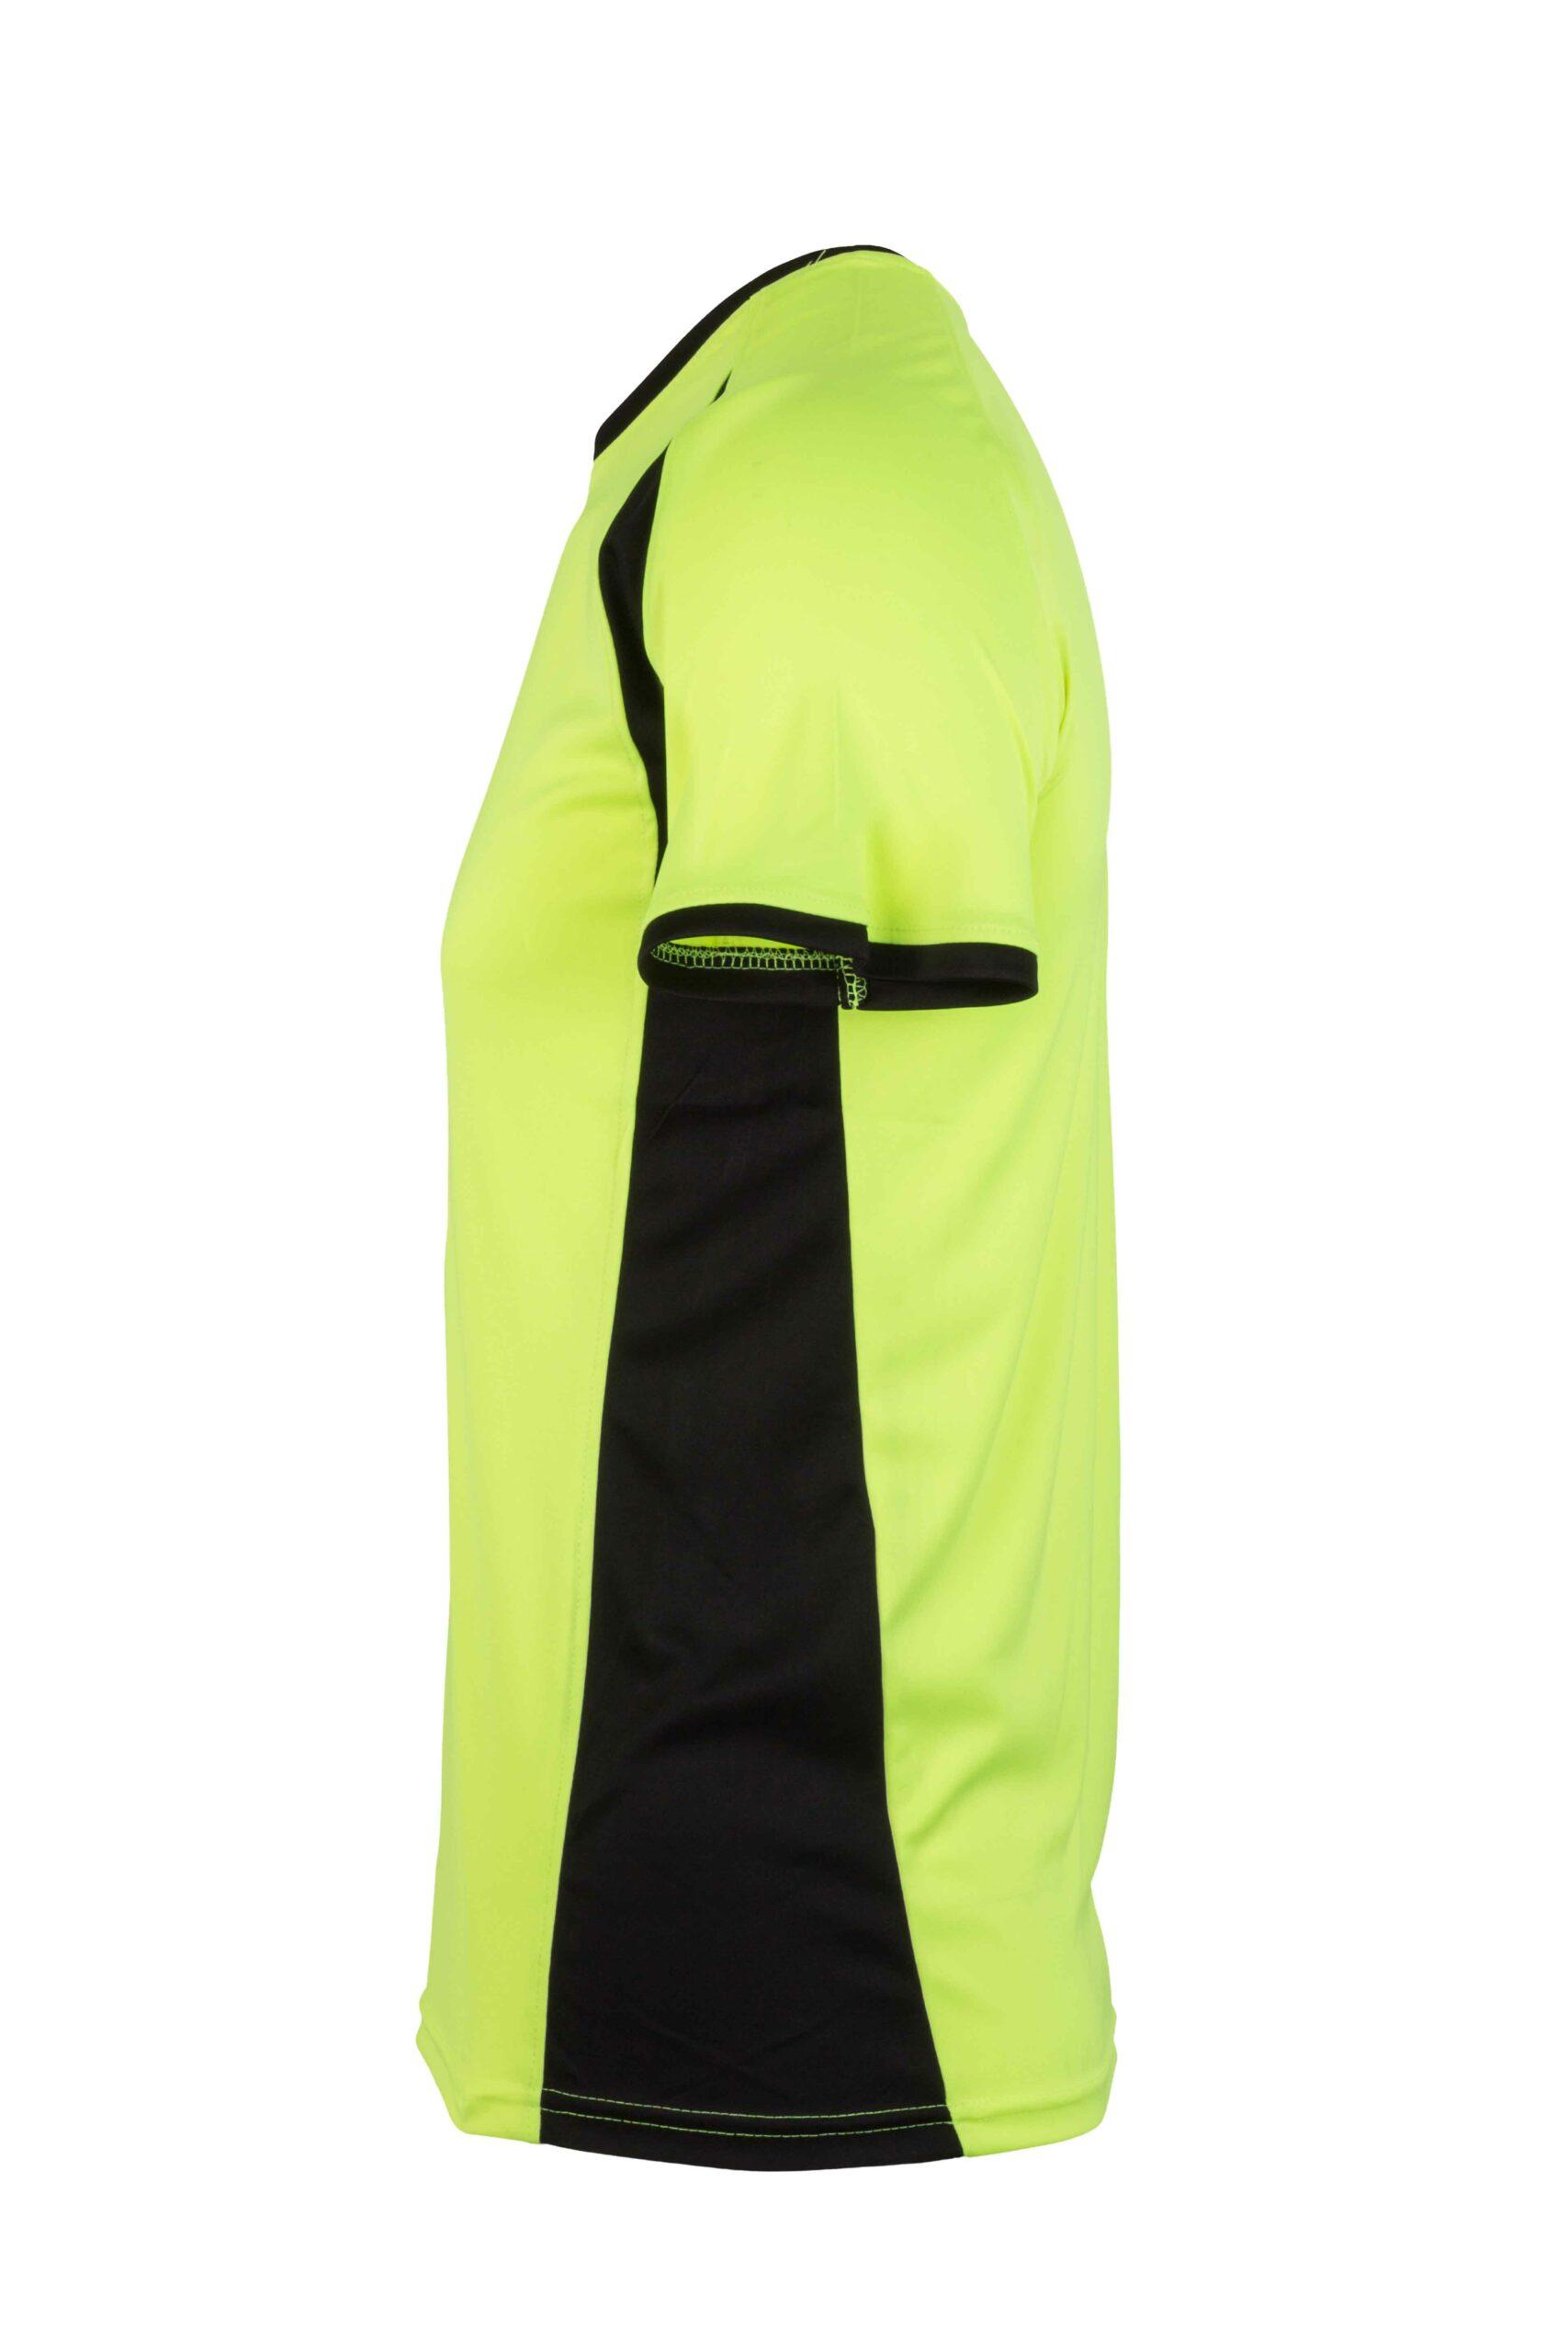 Mukua Mk530v Mukua Camiseta TÉcnica Manga Corta Bicolor FlÚor Yellow Blak 3